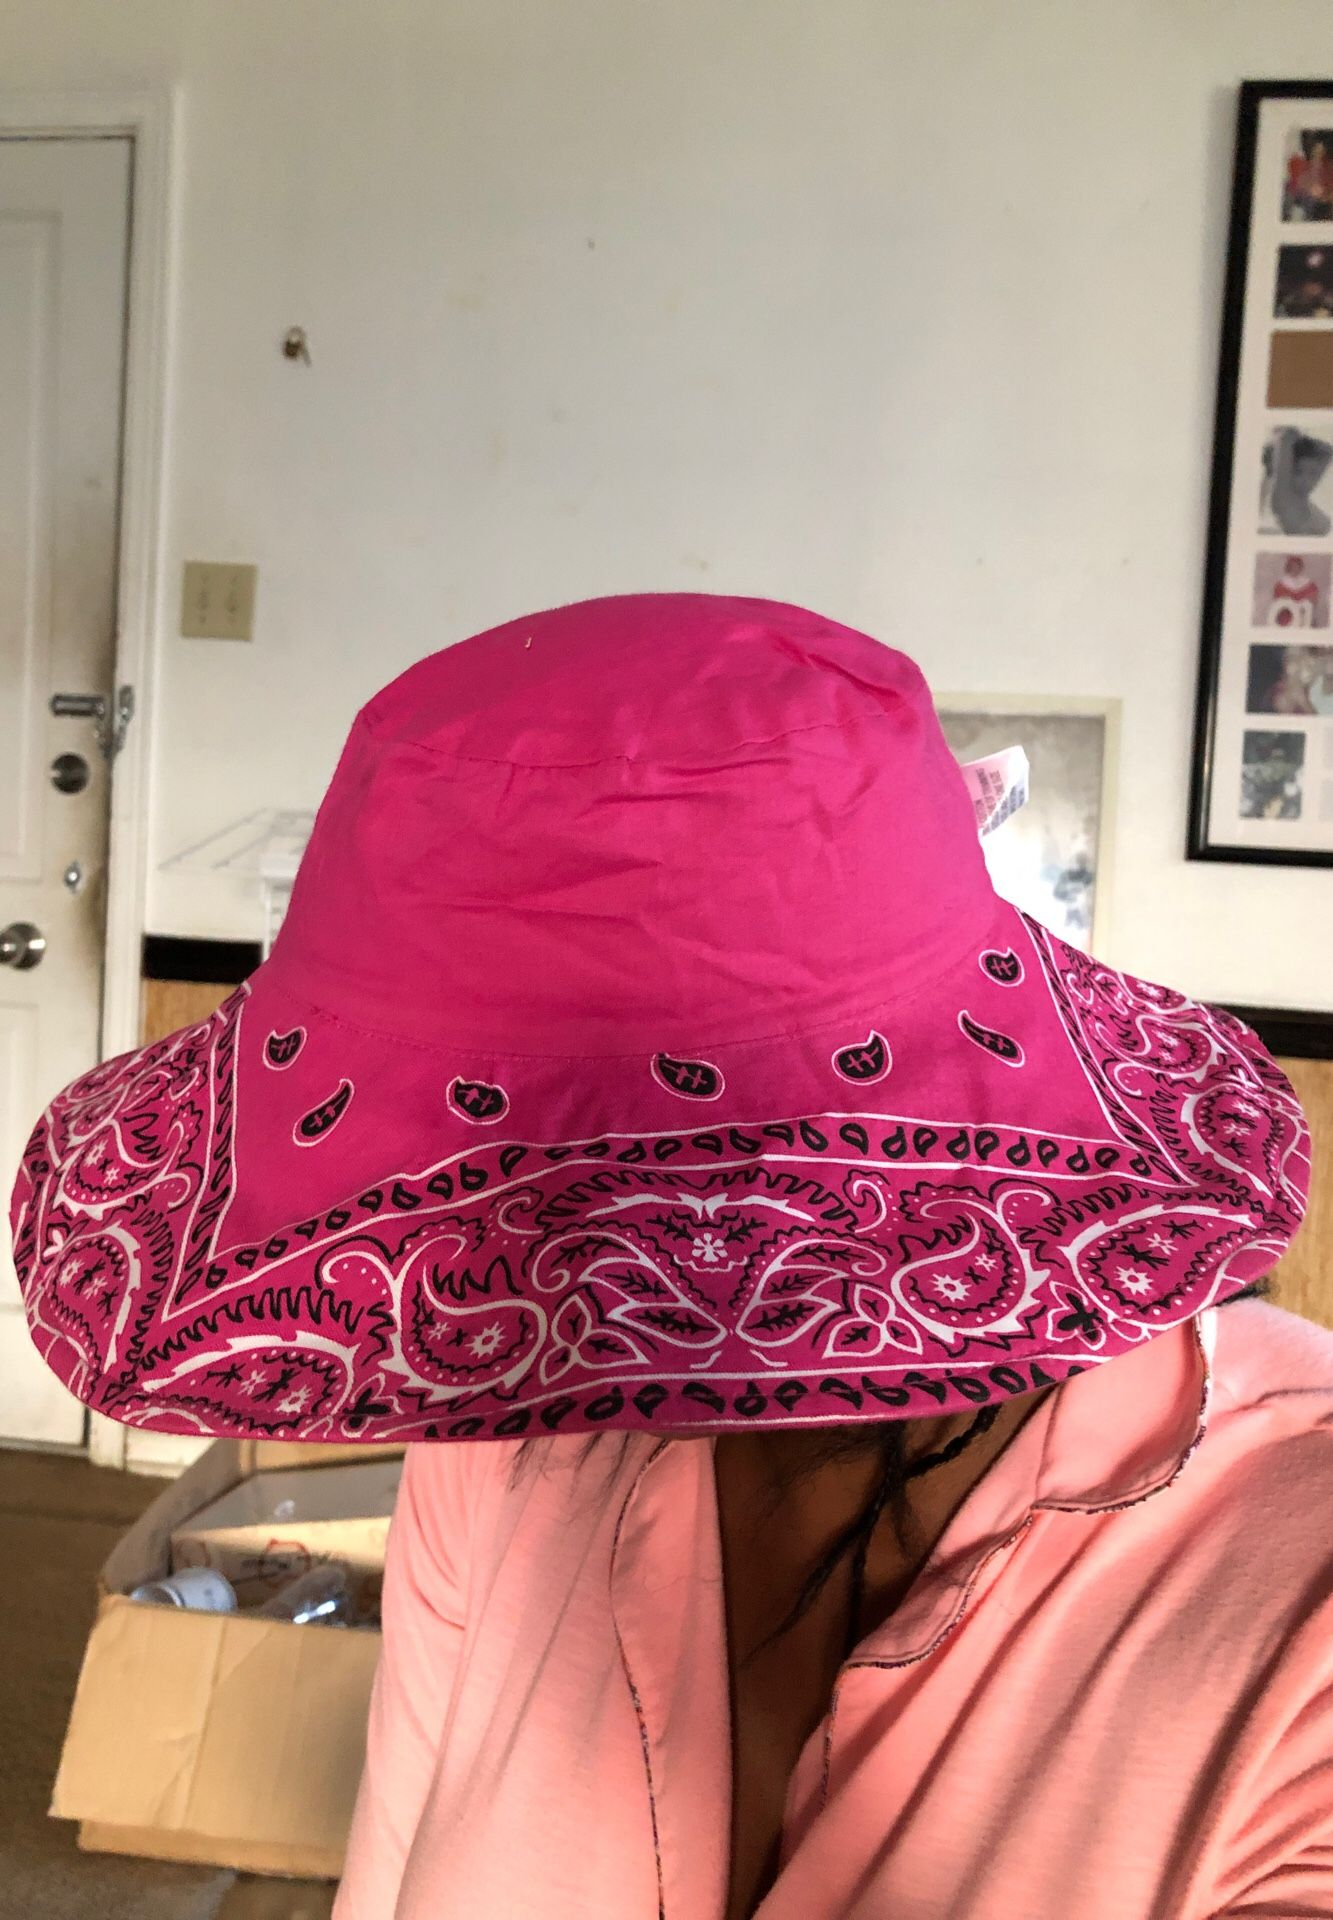 Pink bandanna style hat